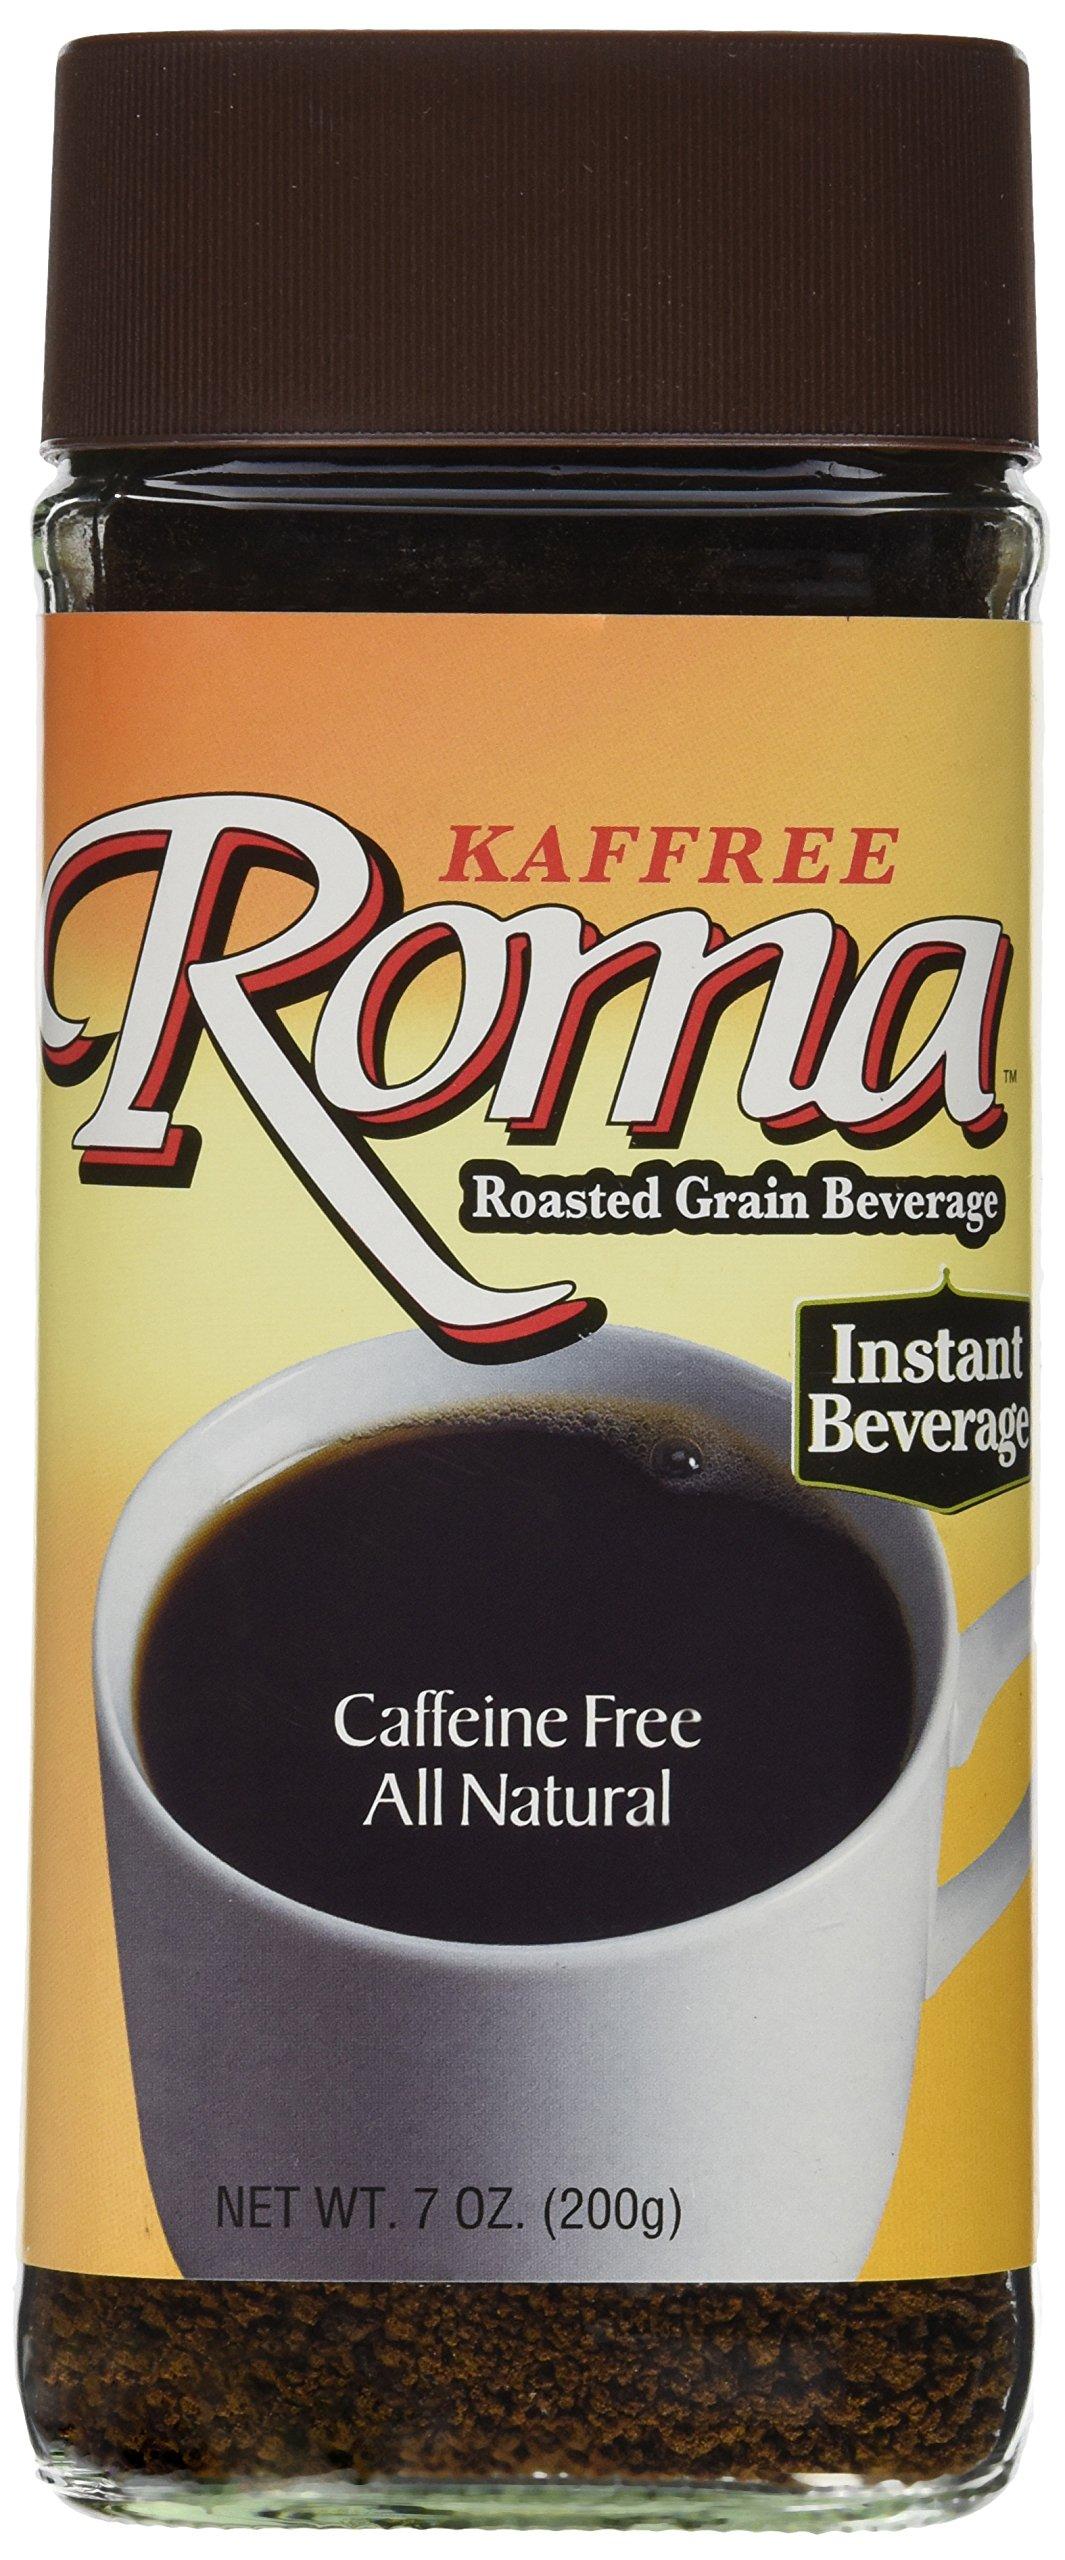 Kaffree Roma, 7 oz (pack of 6 )